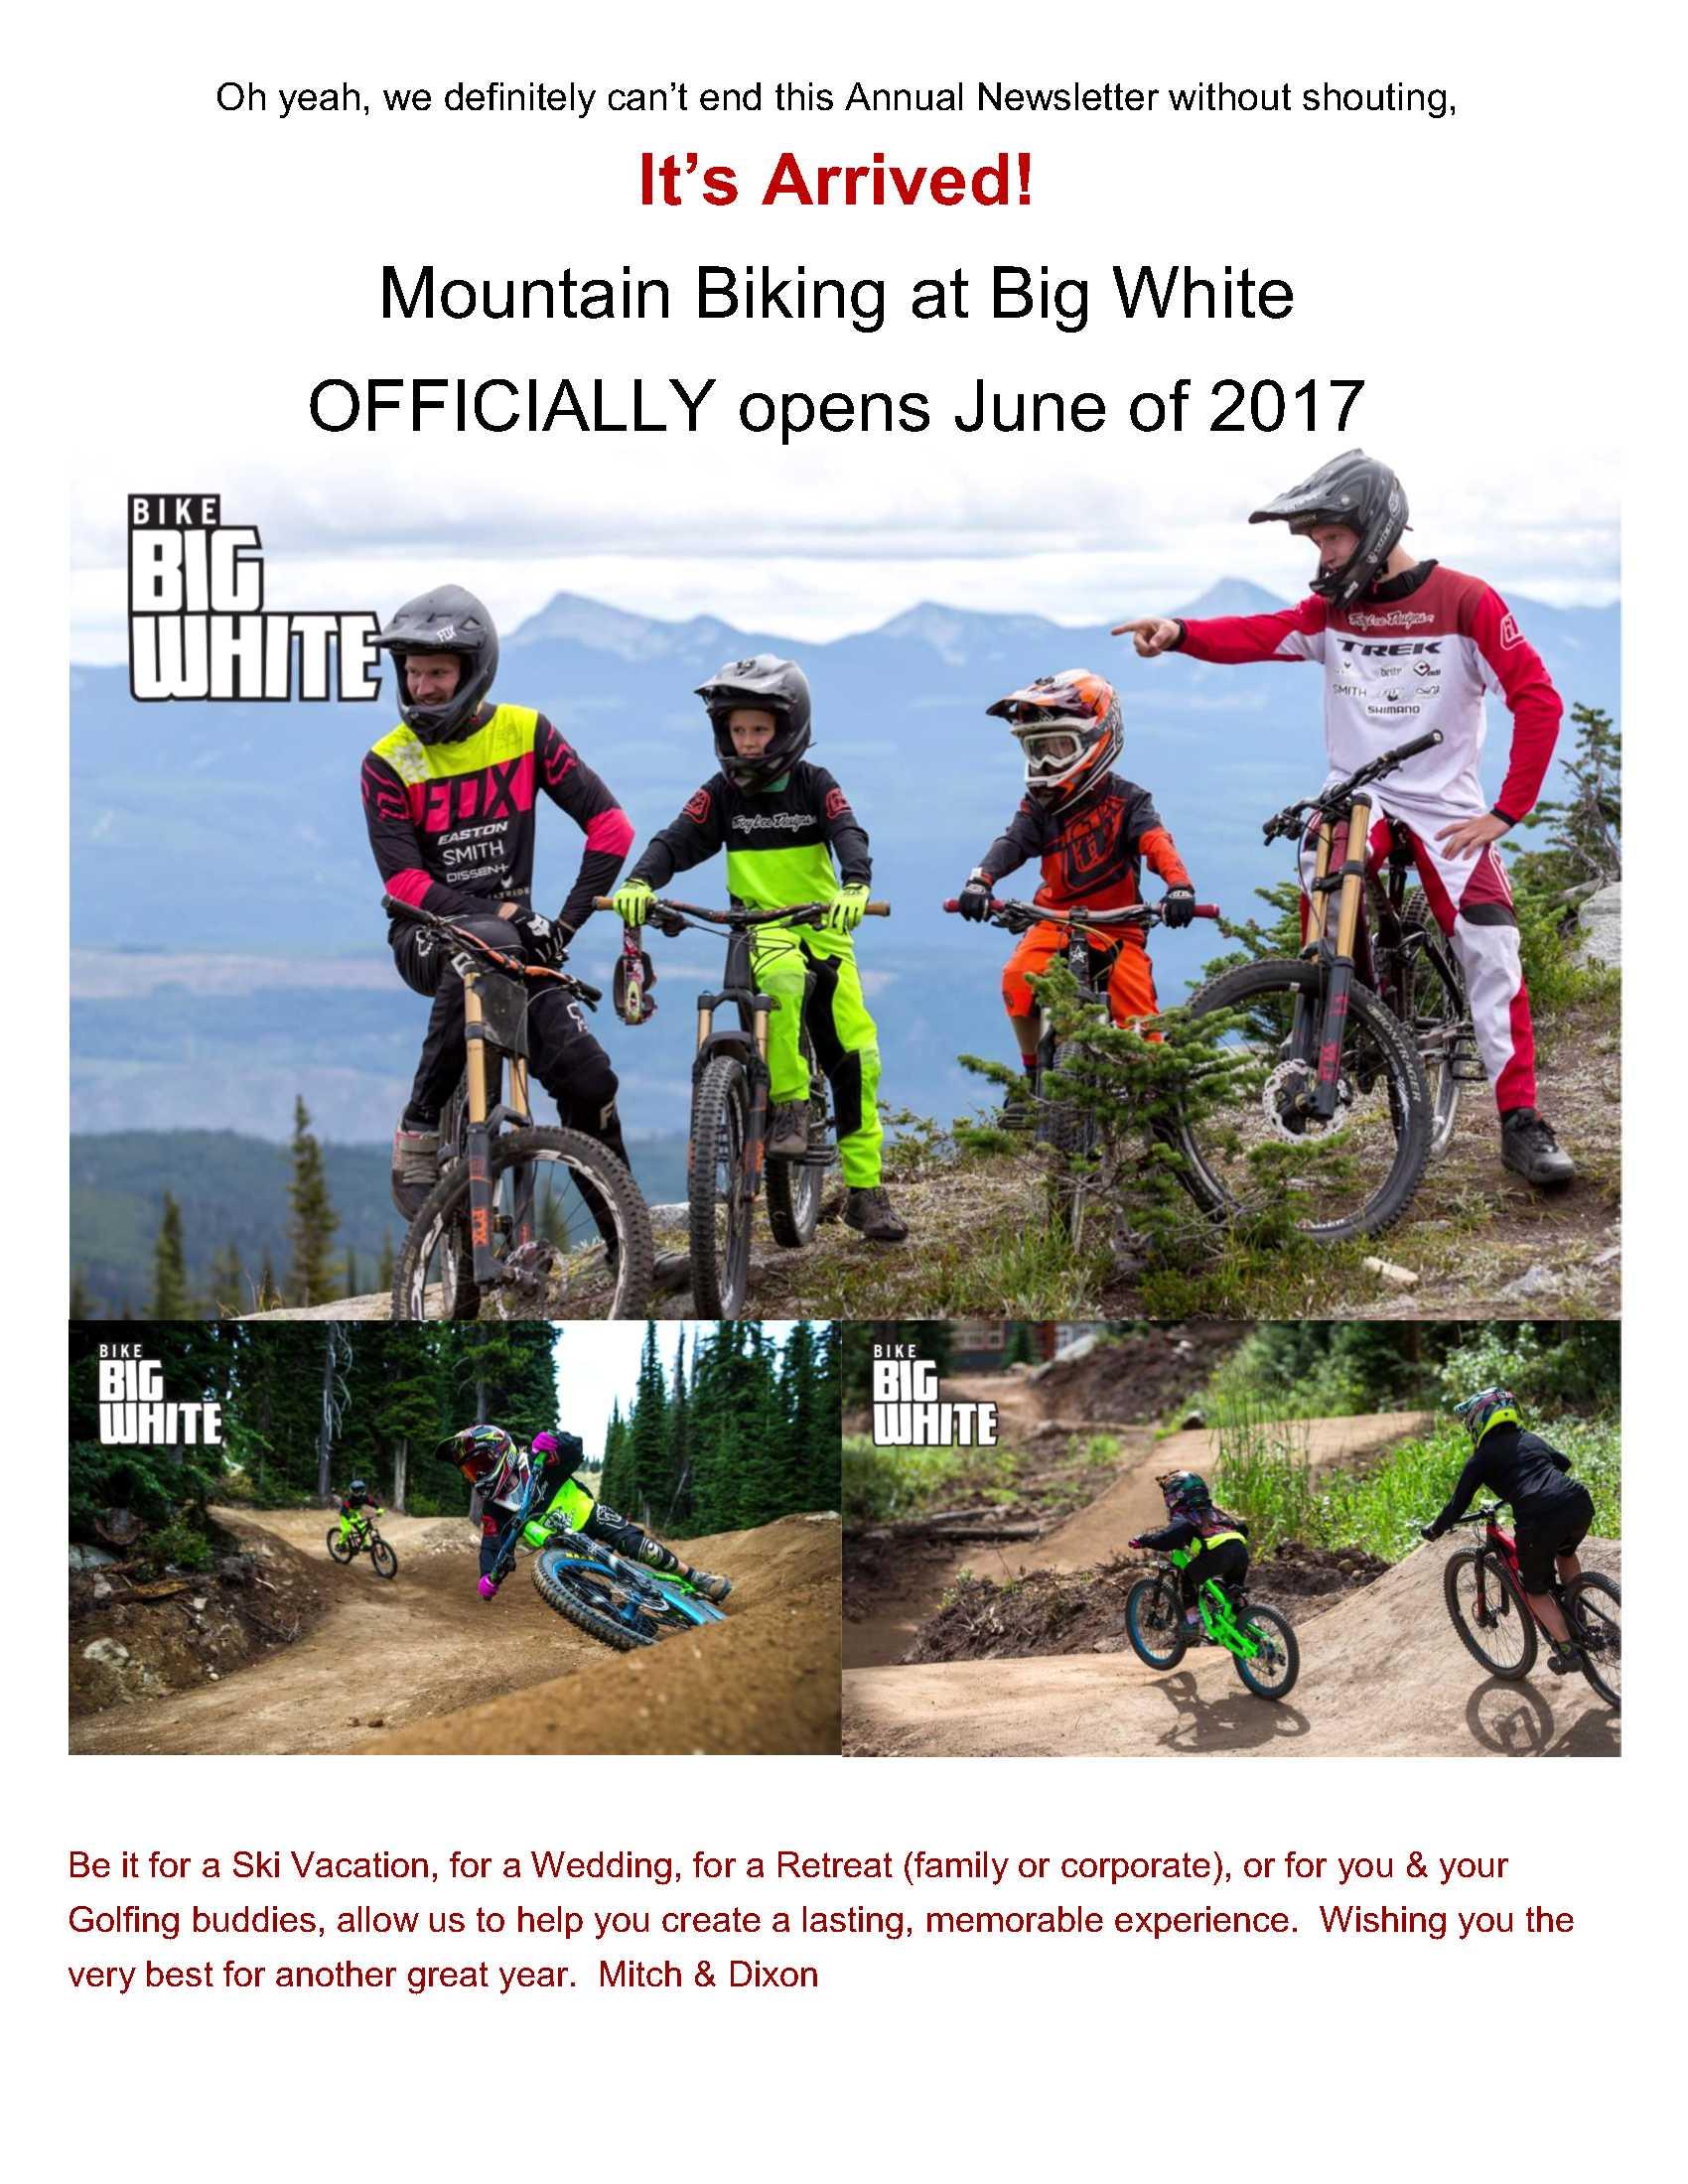 It's really happening!  Mountain Biking at Big White!